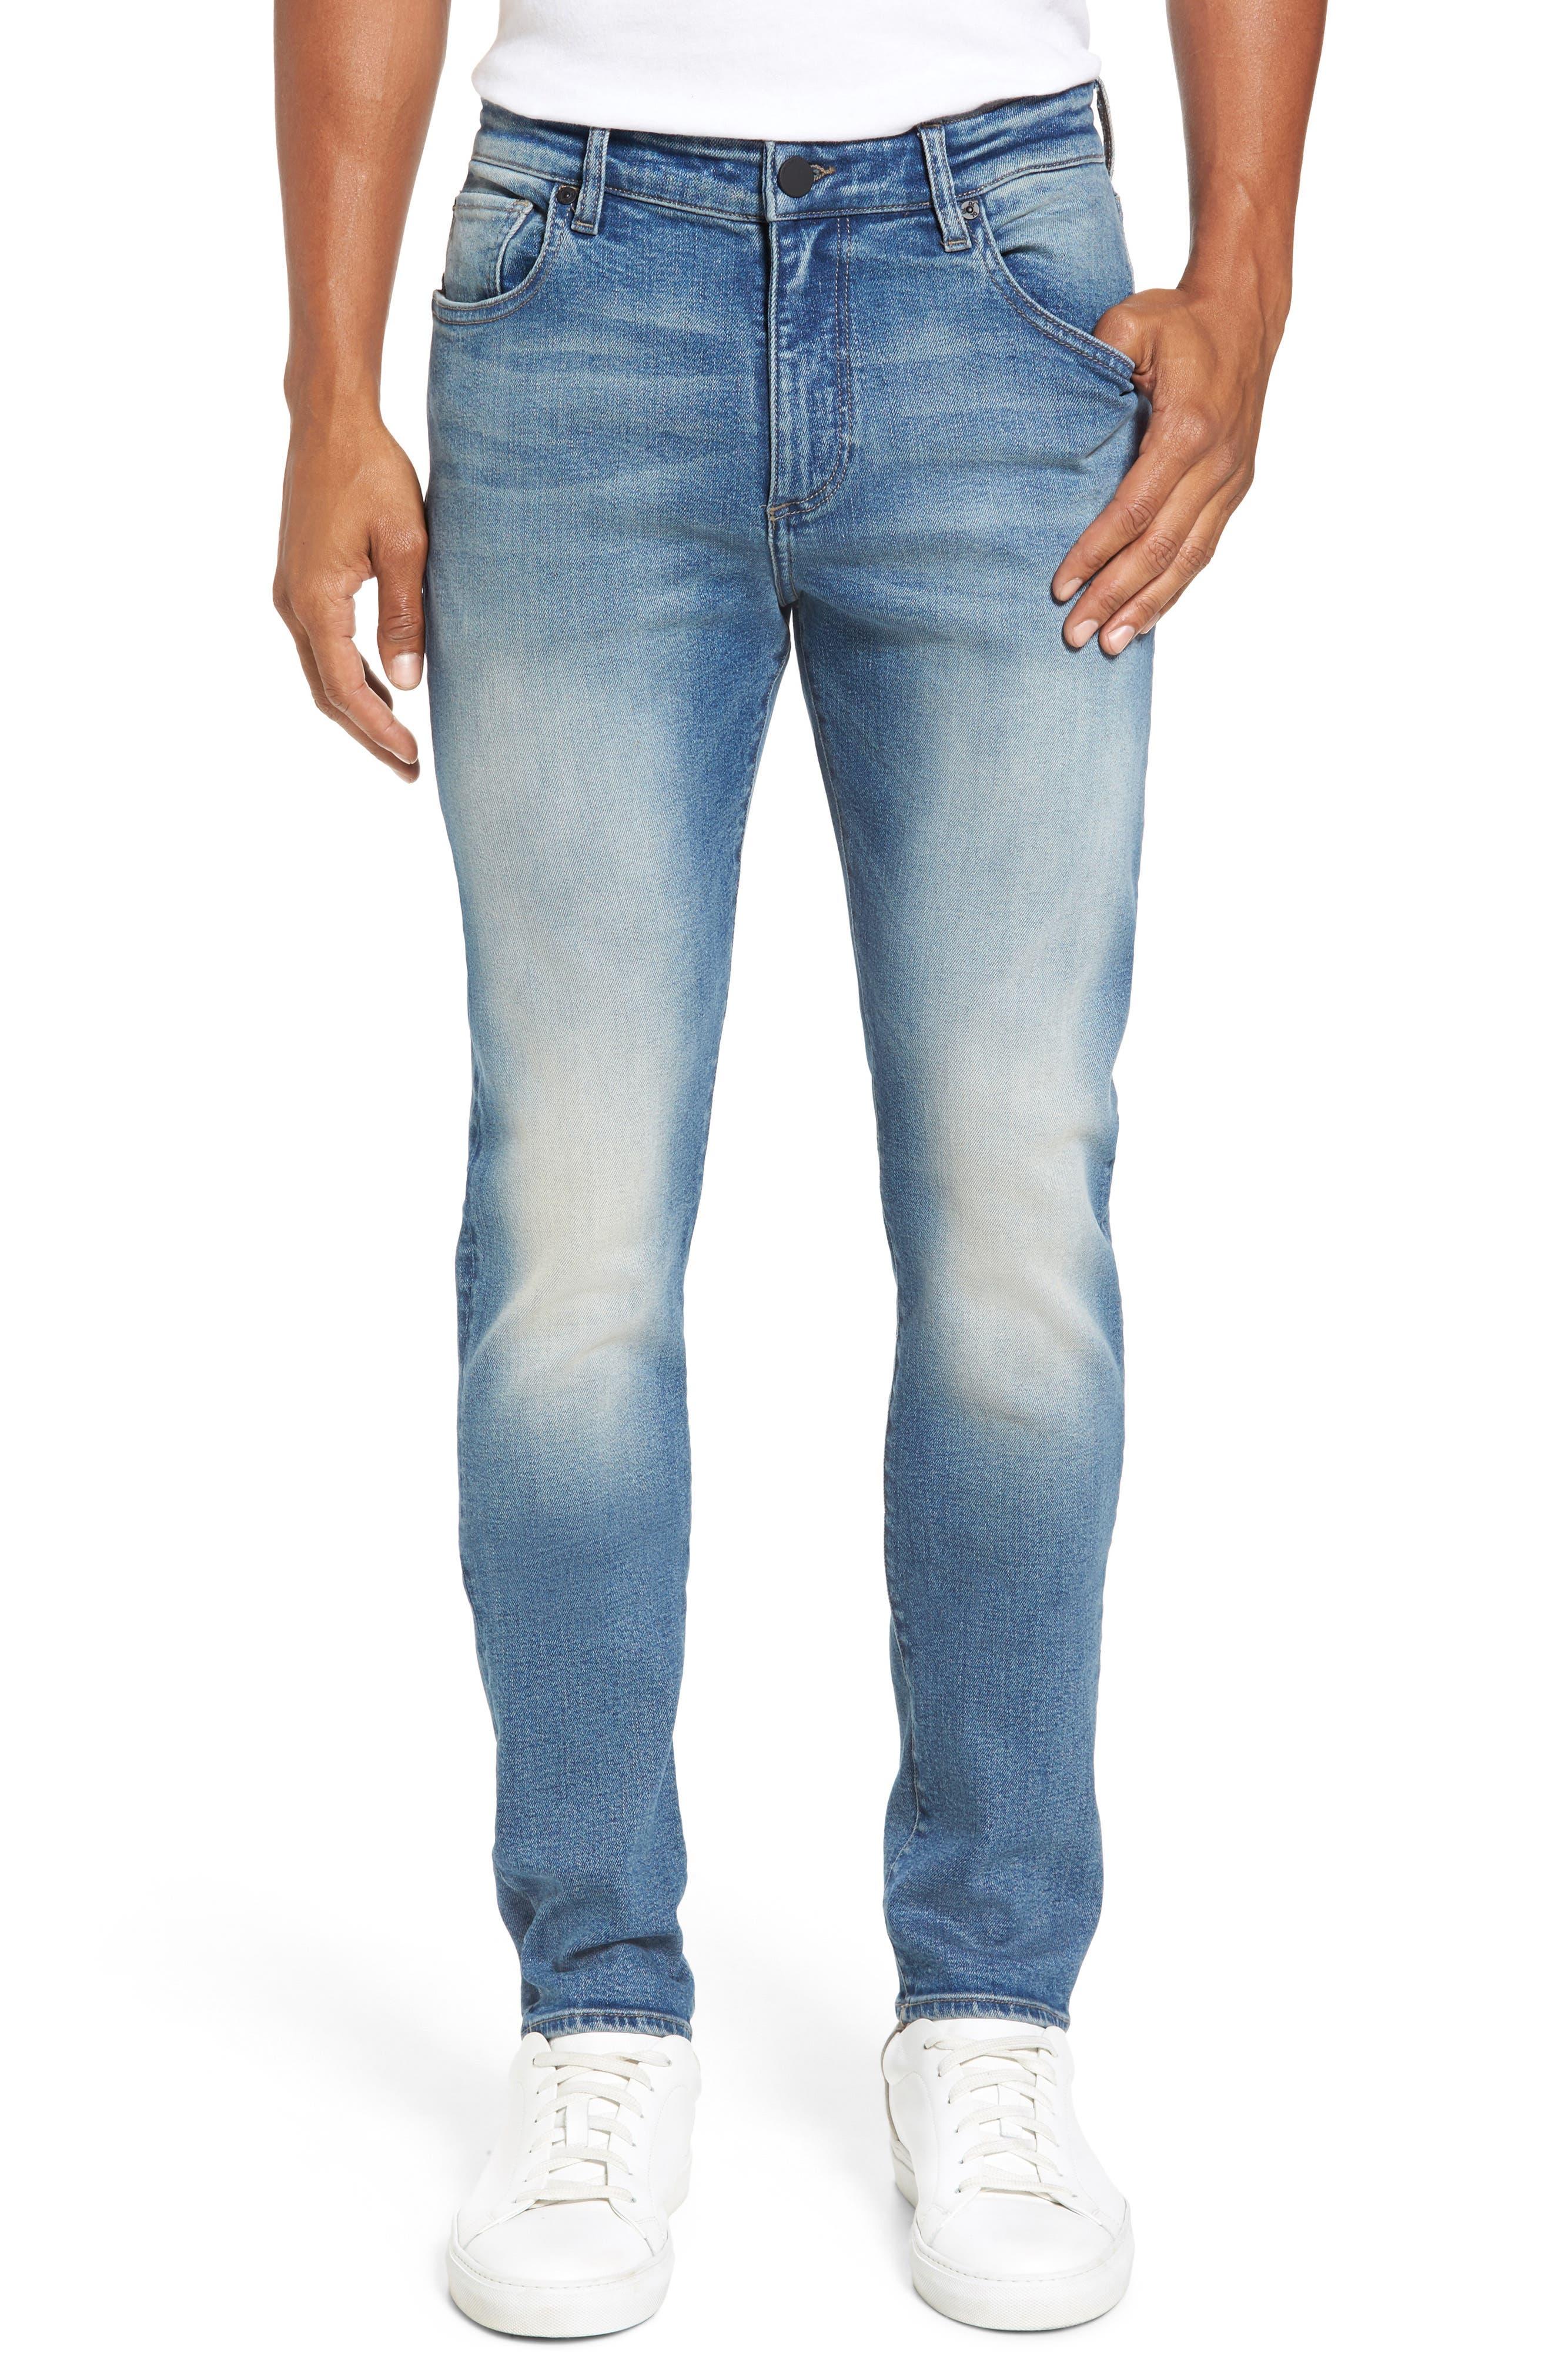 Hunter Skinny Jeans,                             Main thumbnail 1, color,                             HALT 2